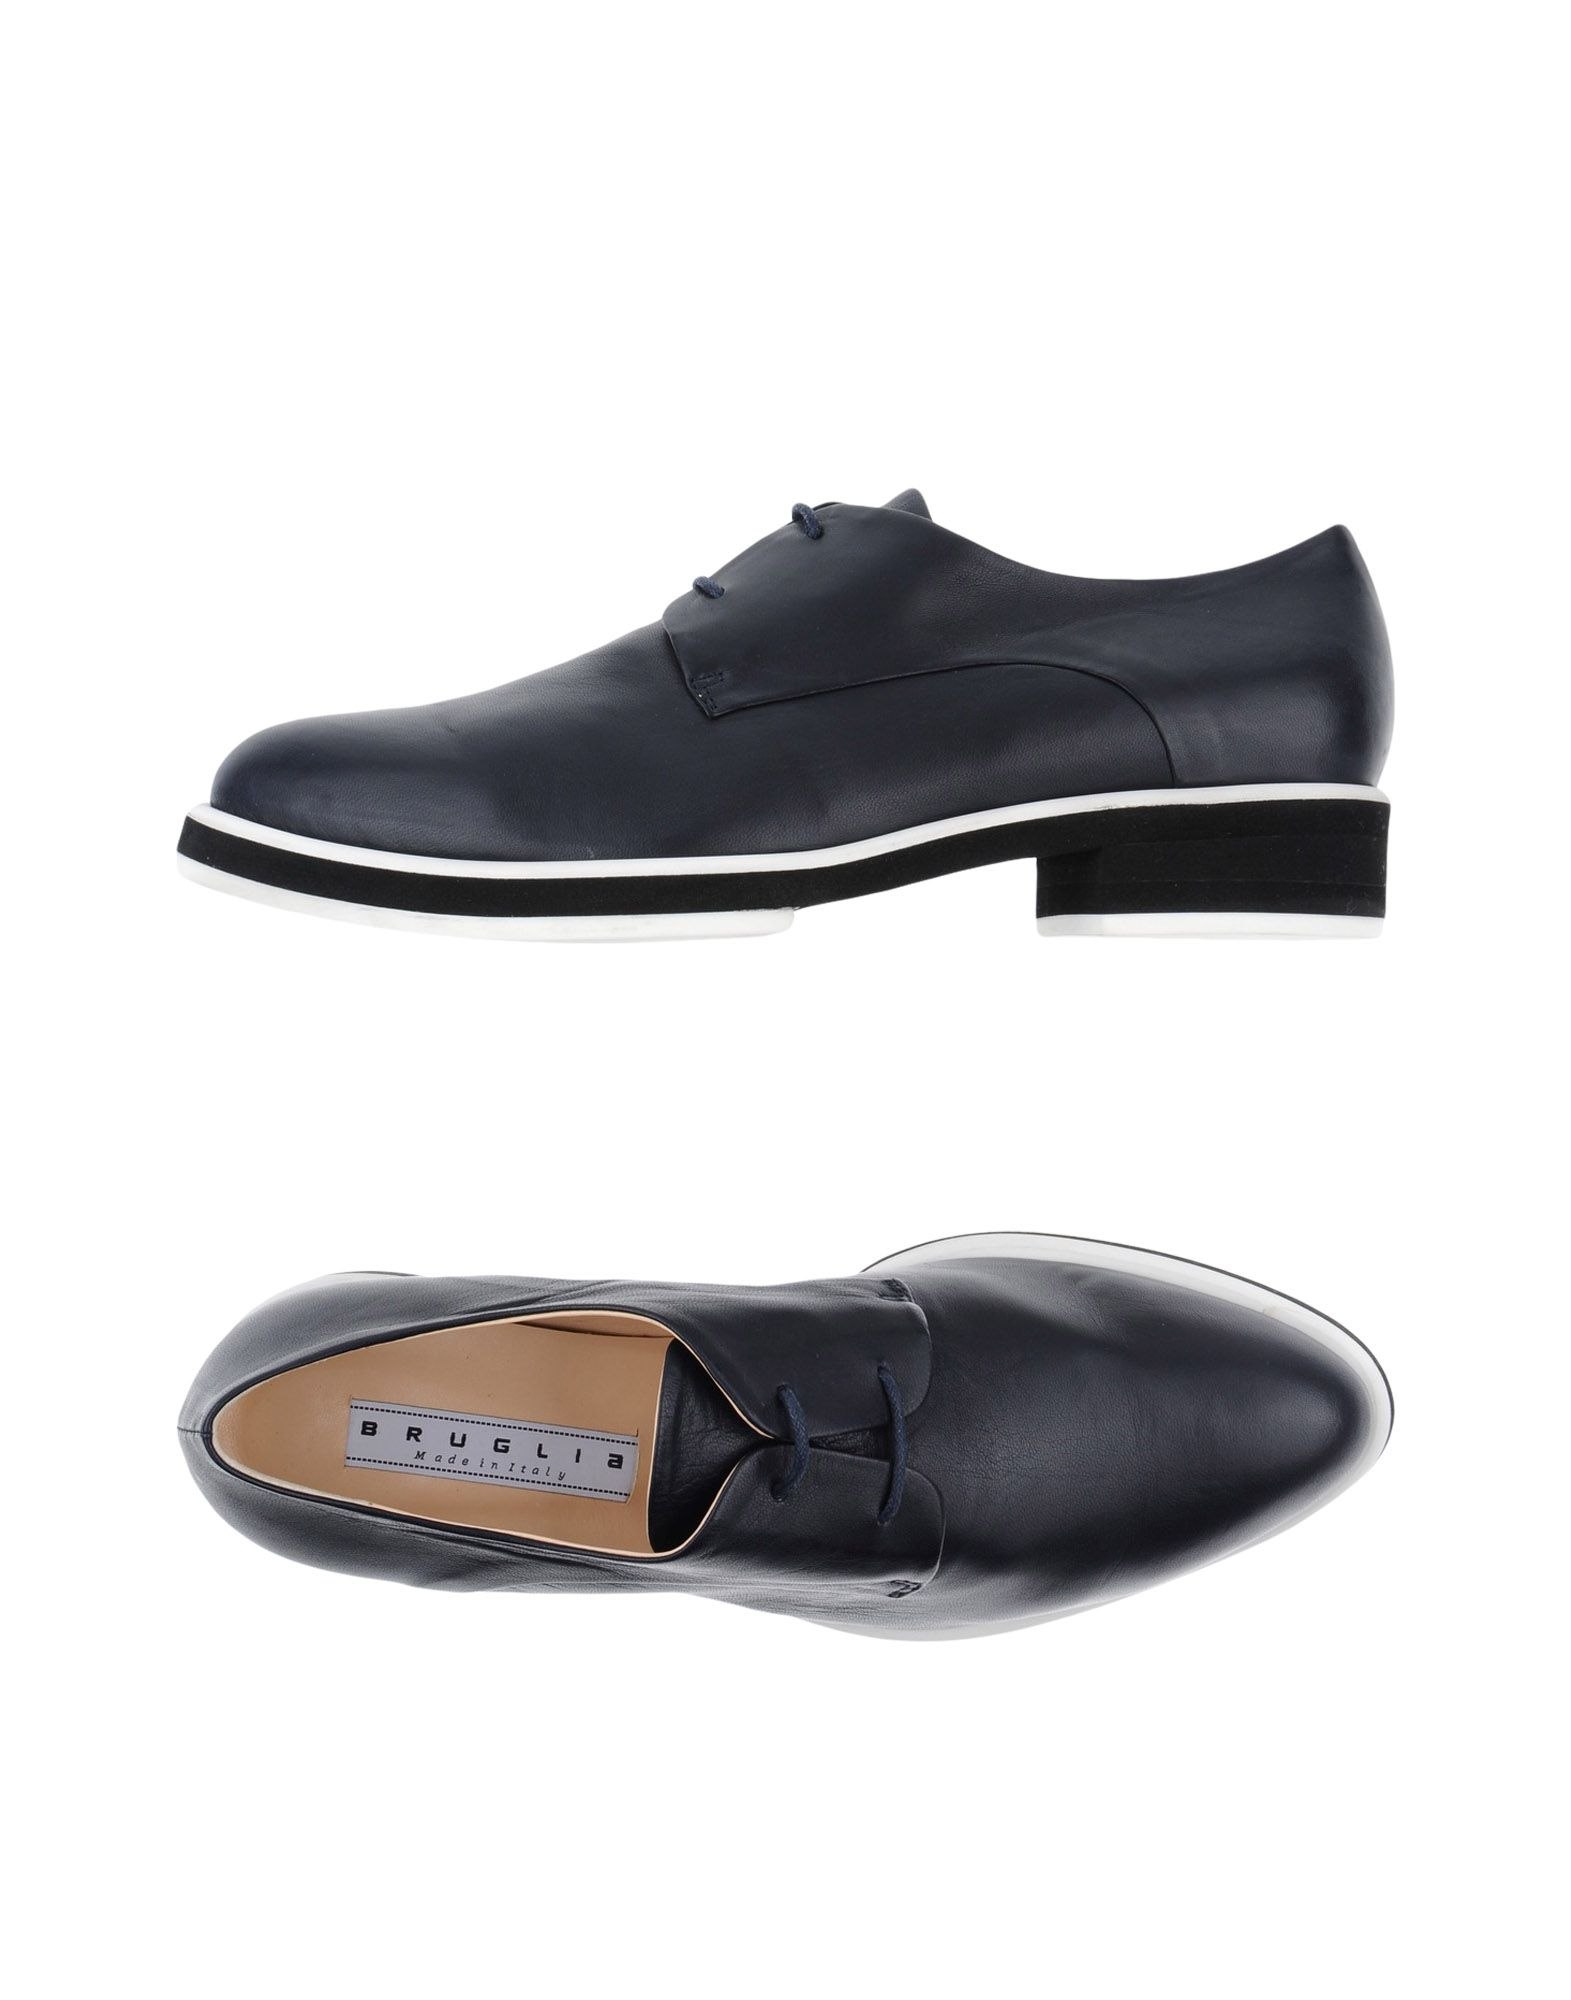 Zapatos casuales salvajes Zapato De Cordones F.Lli Bruglia De Mujer - Zapatos De Bruglia Cordones F.Lli Bruglia  Azul oscuro d31518